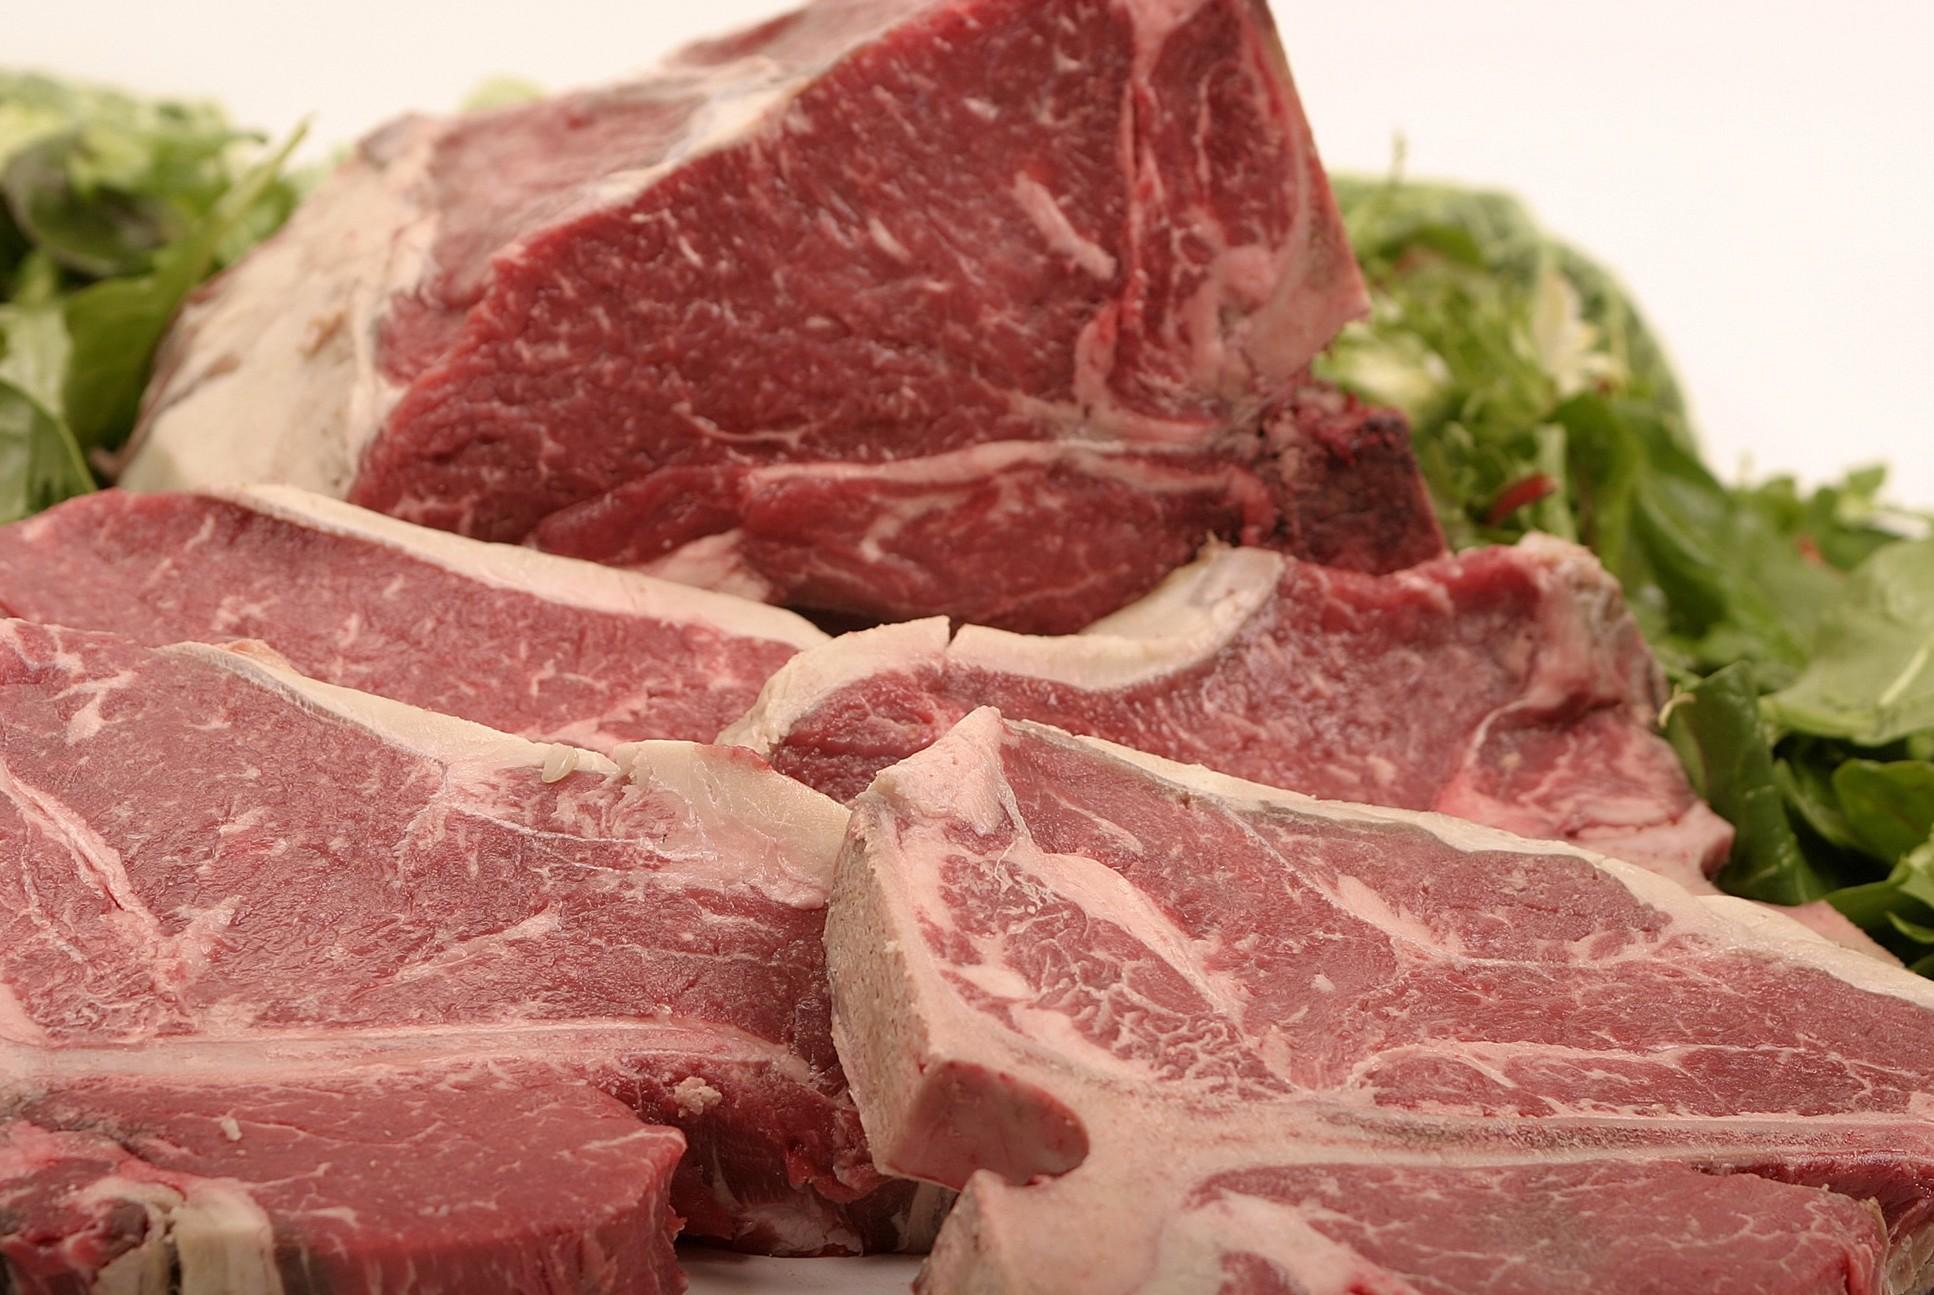 Carne con sempre più batteri in vendita